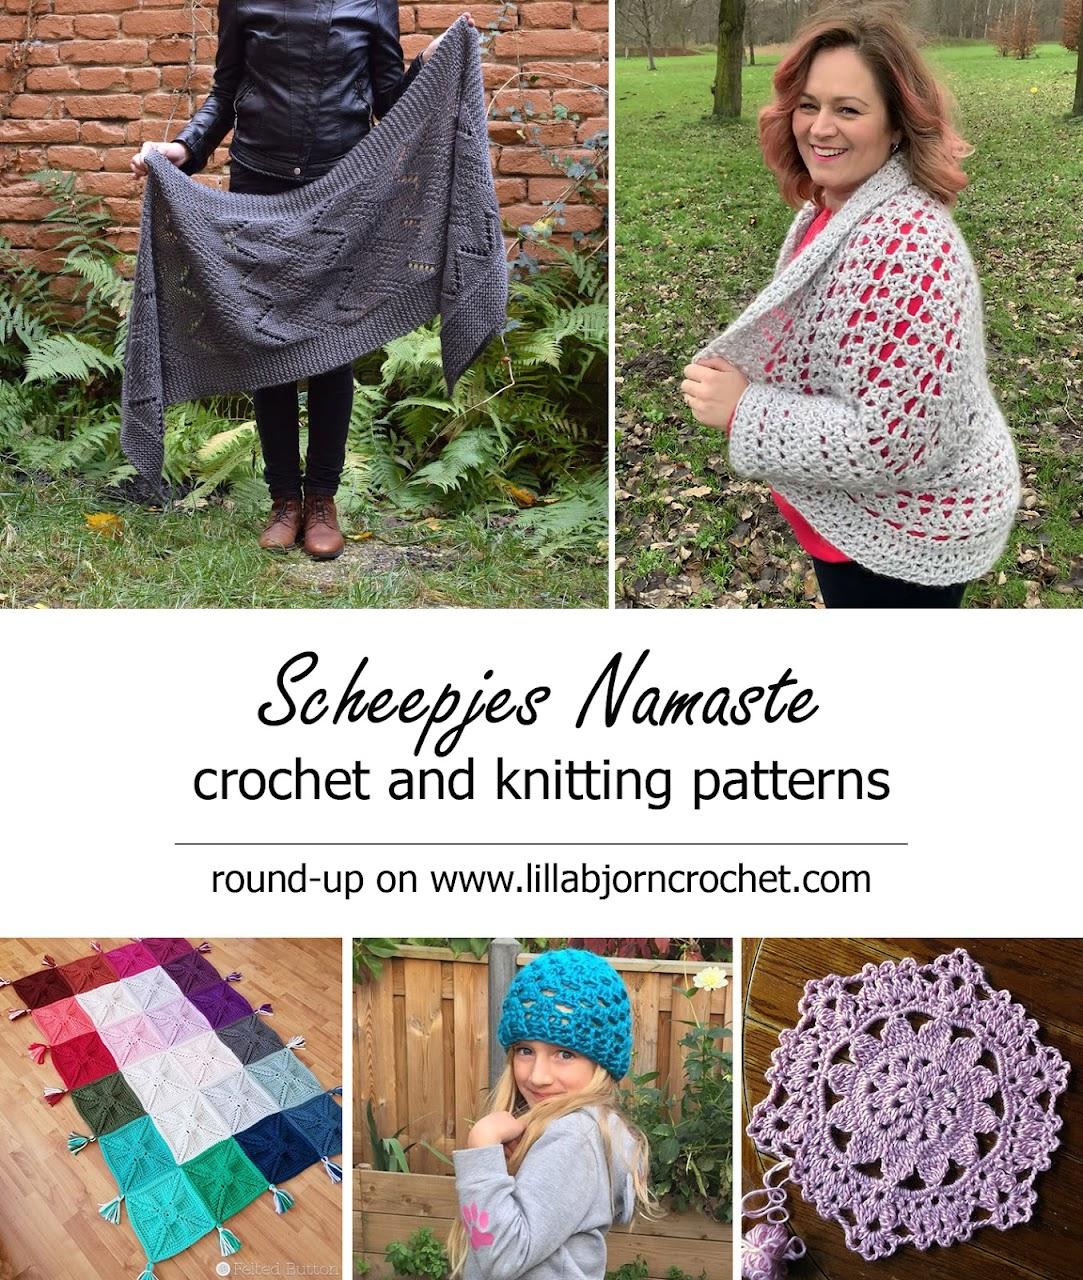 Scheepjes Namaste FREE patterns - round-up by www.lillabjorncrochet.com